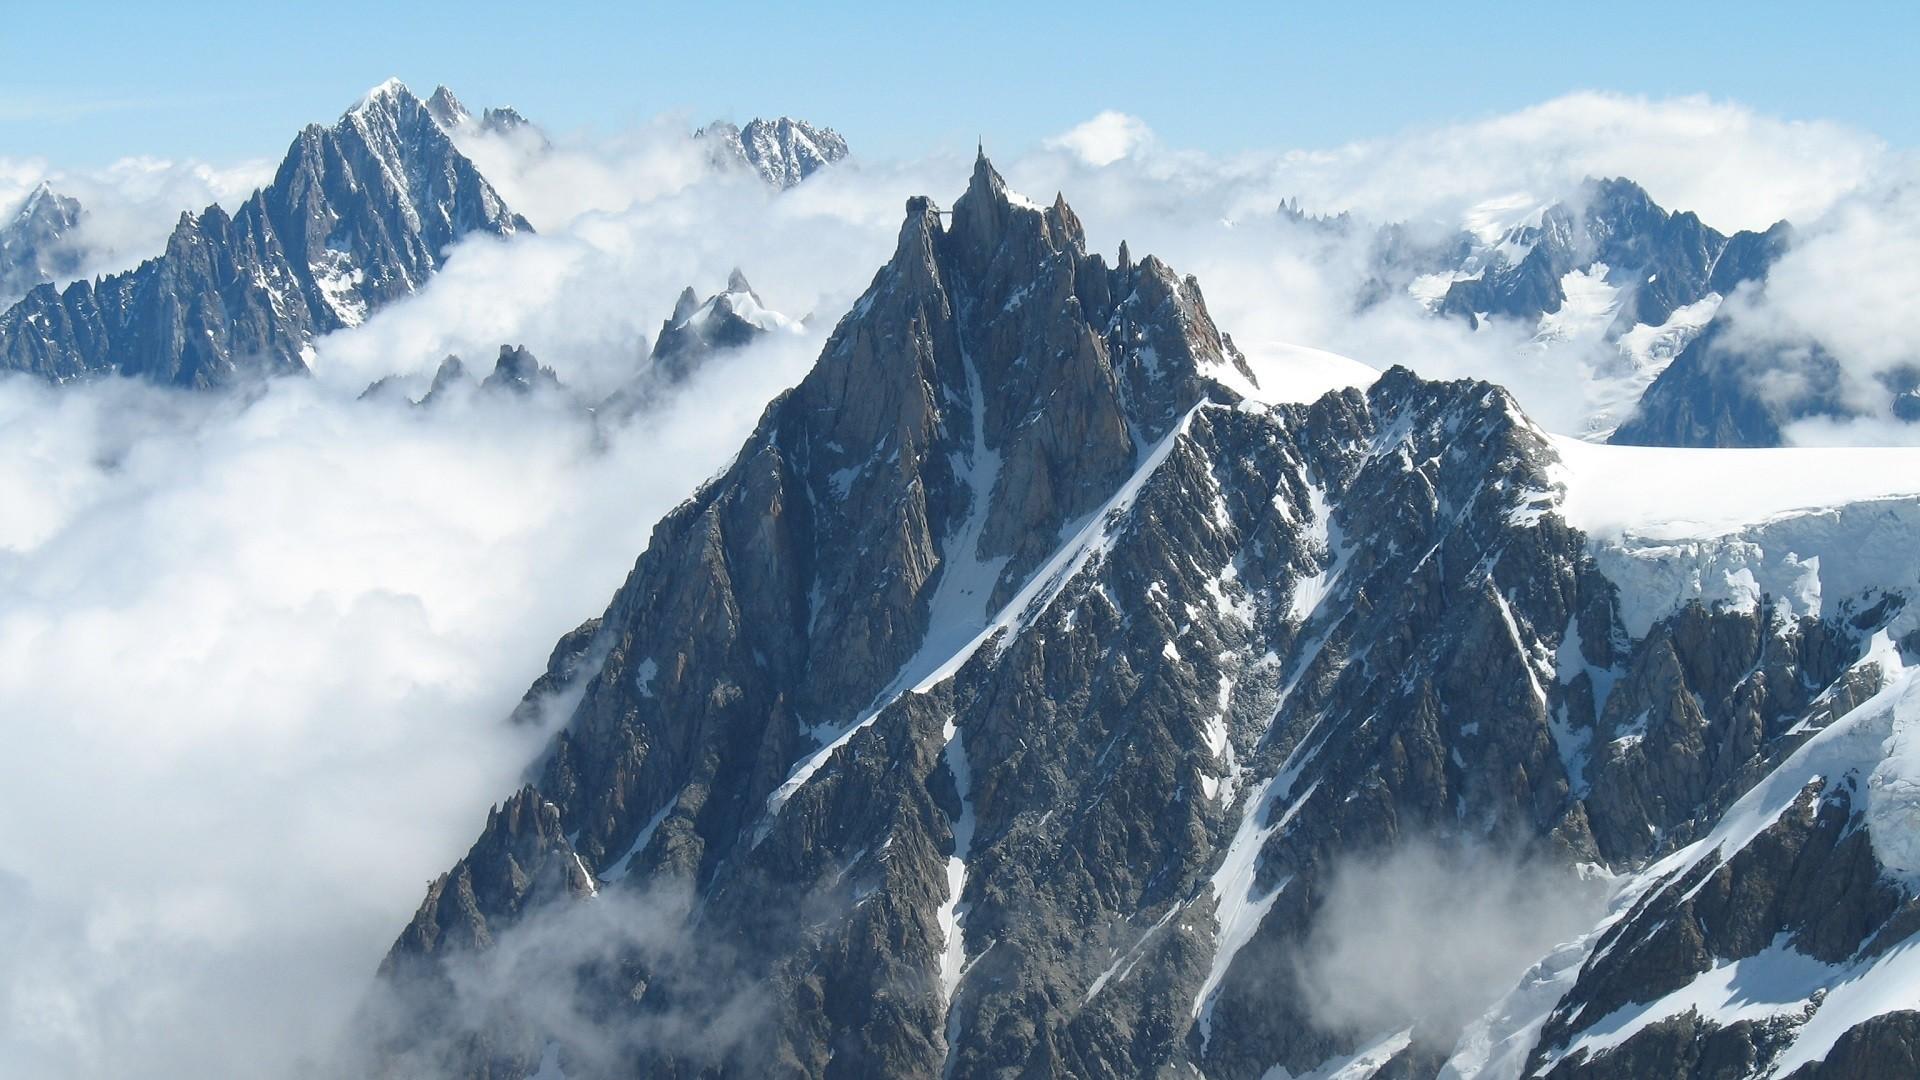 Wallpaper mountains, fog, sky, snow, peaks